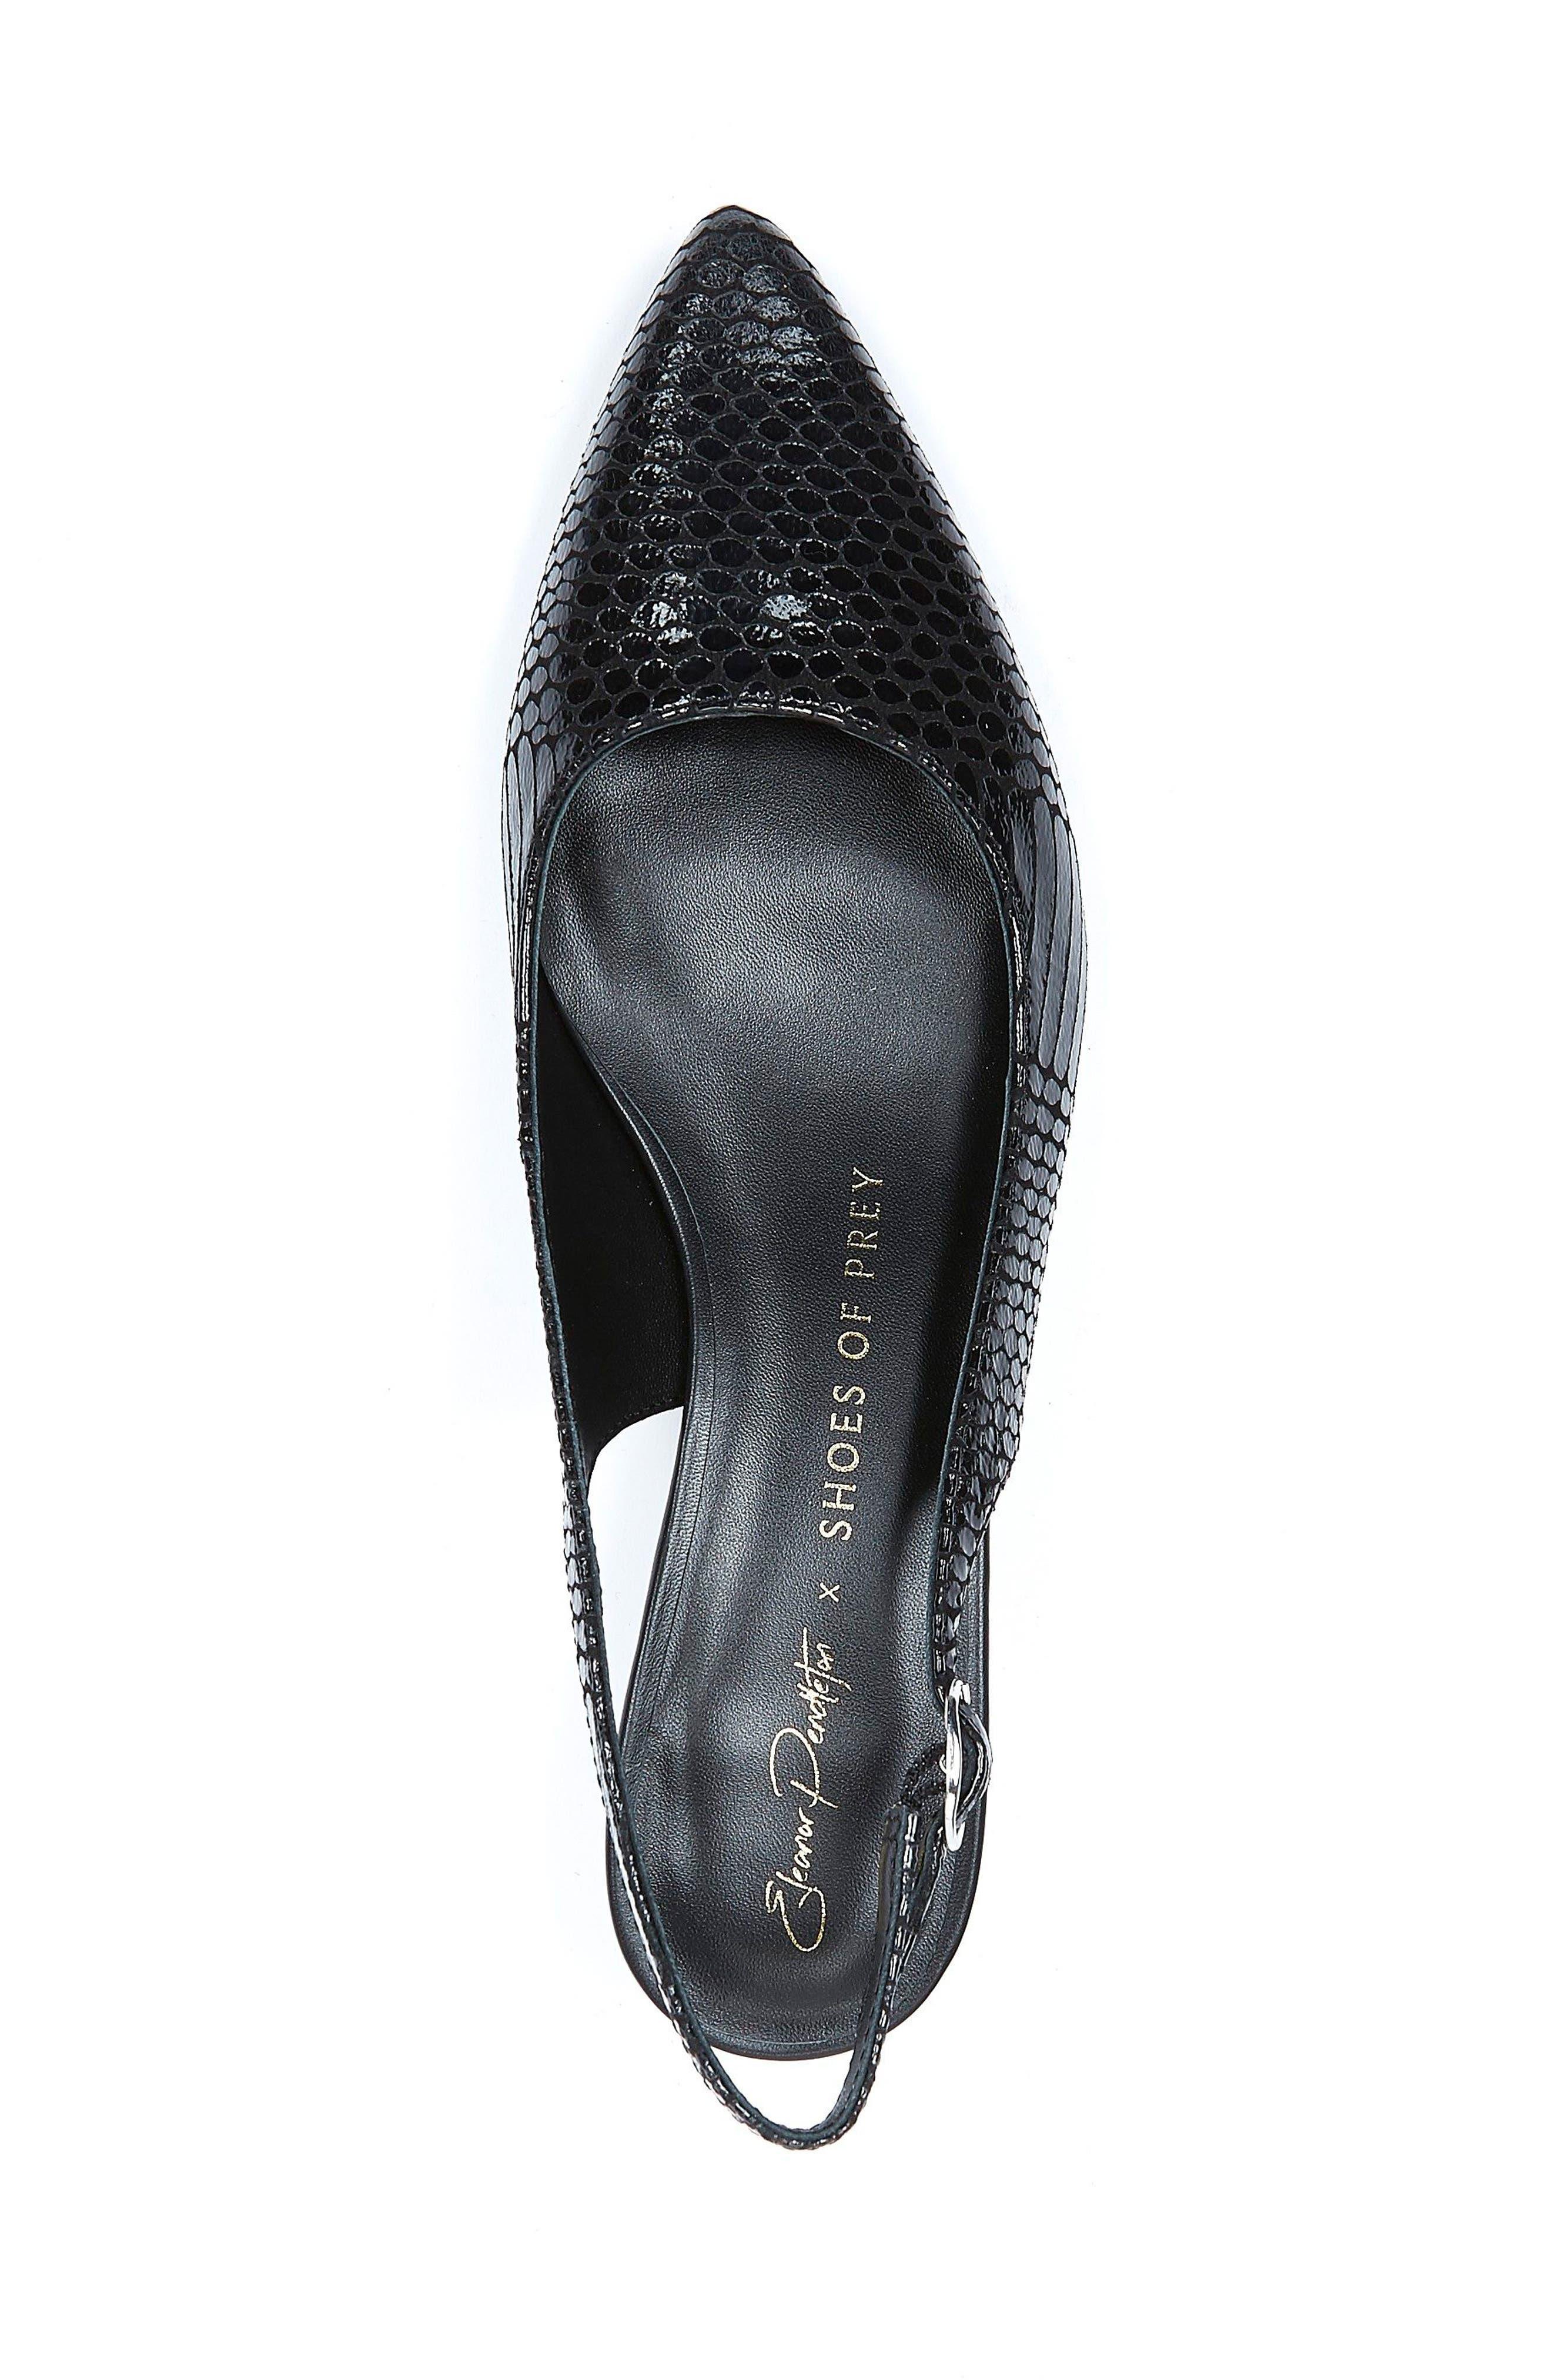 Alternate Image 3  - Shoes of Prey x Eleanor Pendleton Kitten Heel Slingback Pump (Women)